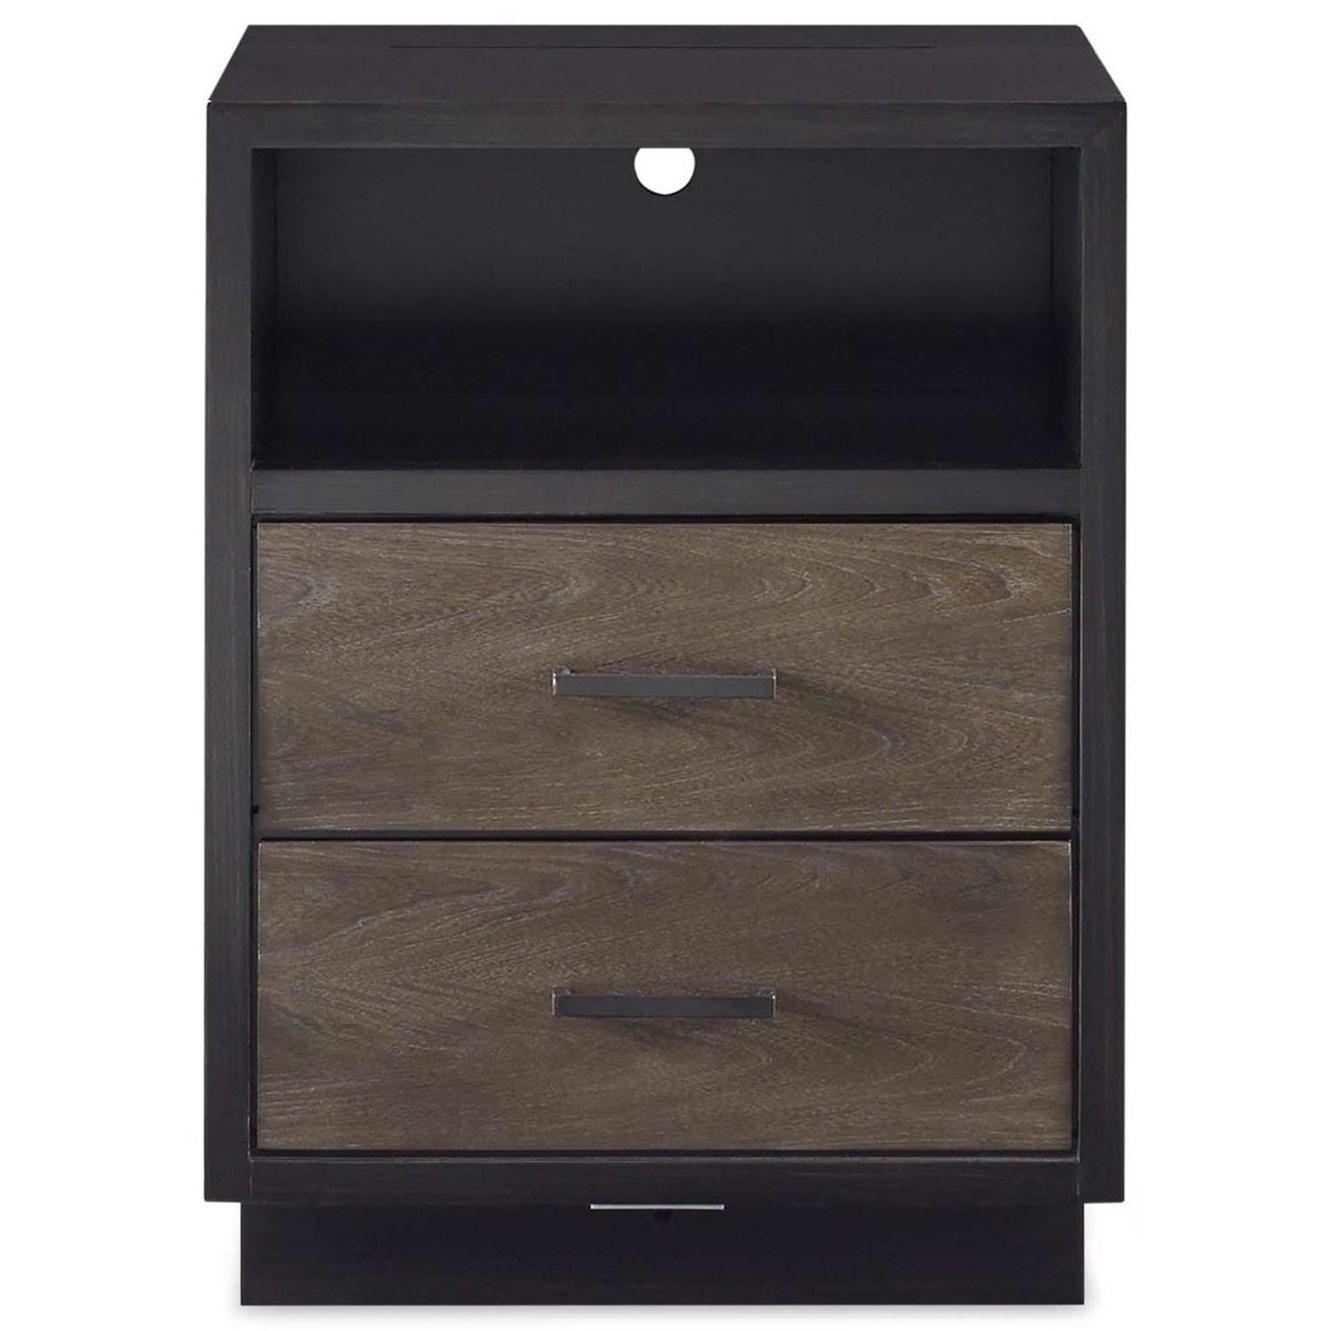 #myRoom Nightstand by Smartstuff at Esprit Decor Home Furnishings